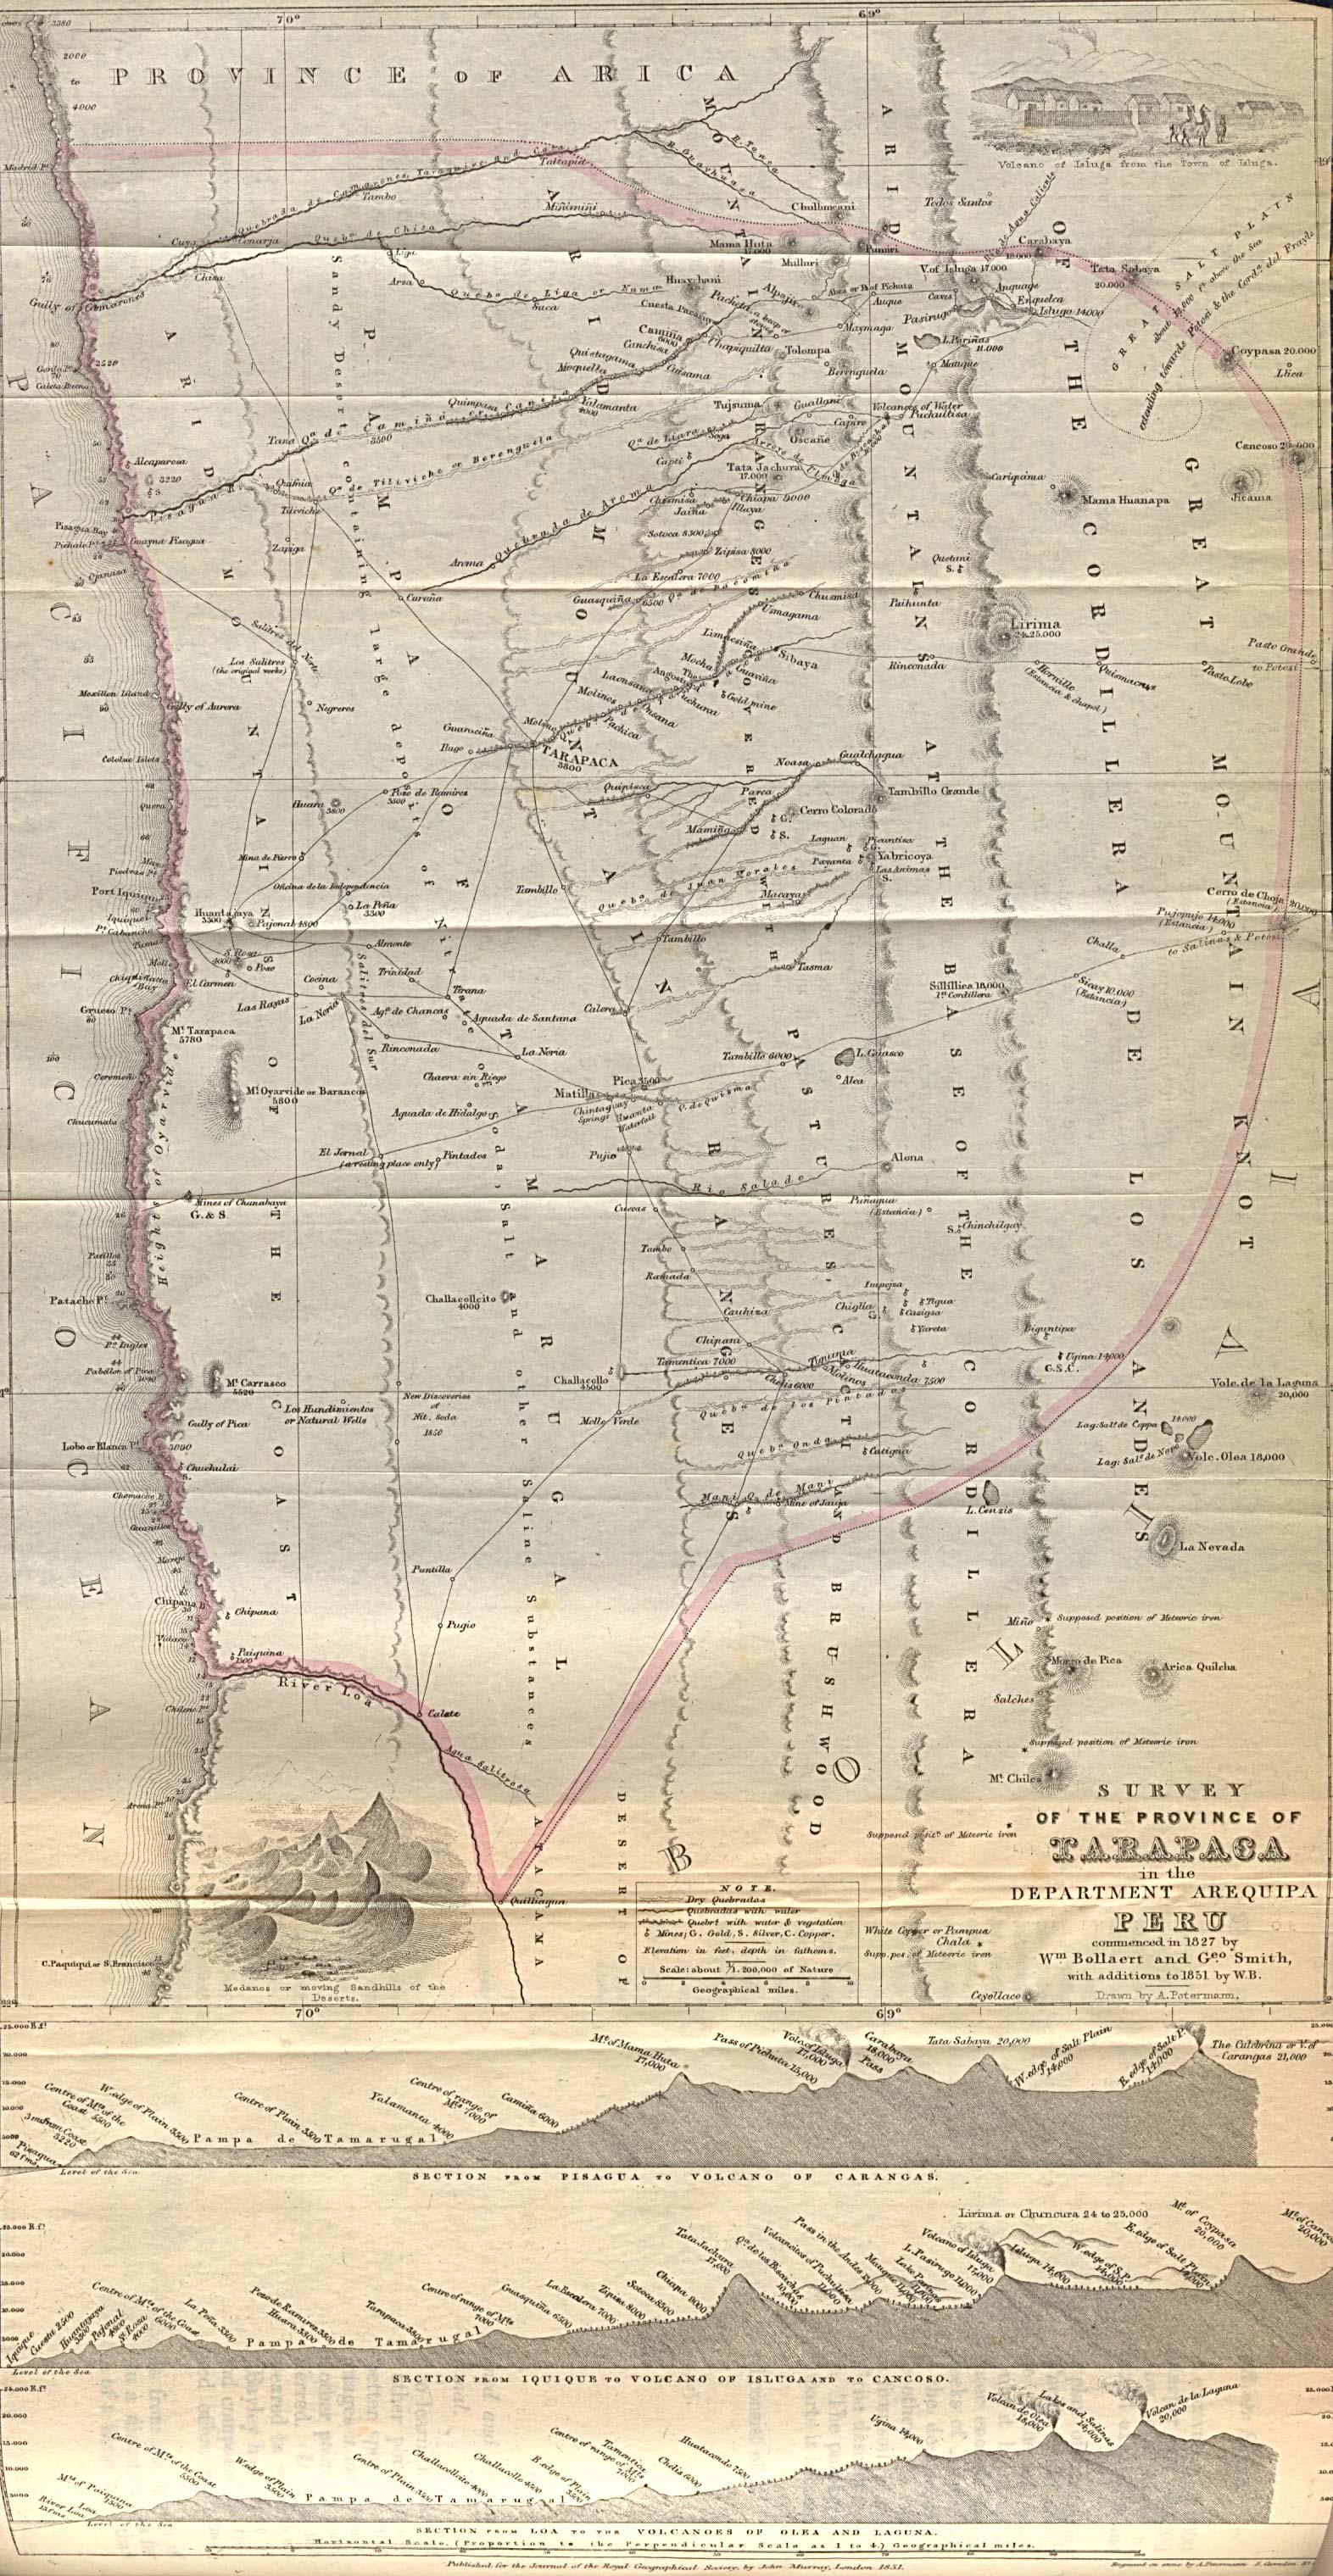 Mapa de la Provincia de Tarapacá, Perú 1851